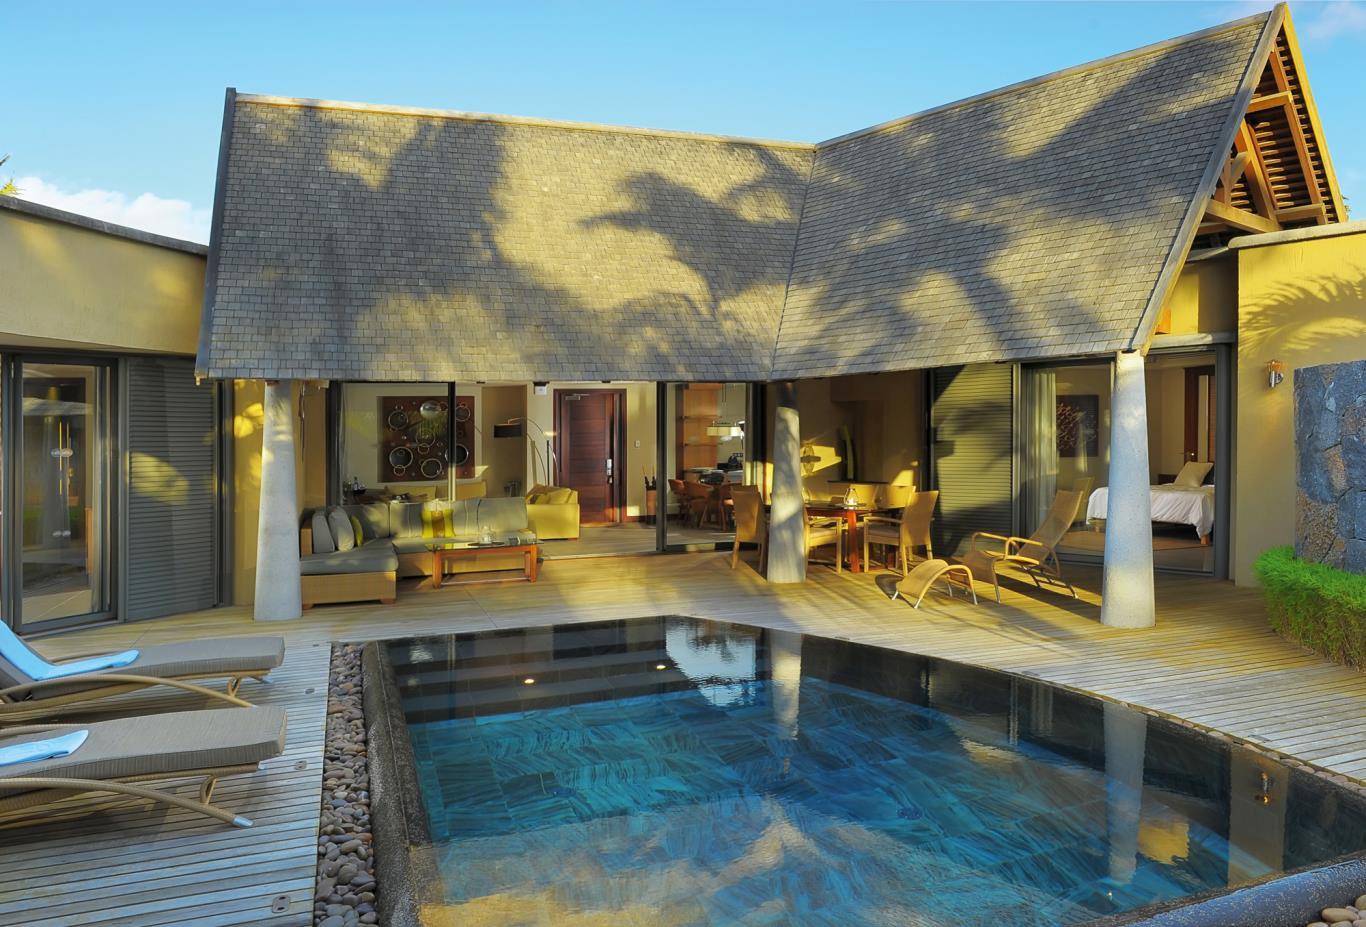 Pool-villa-2-bed